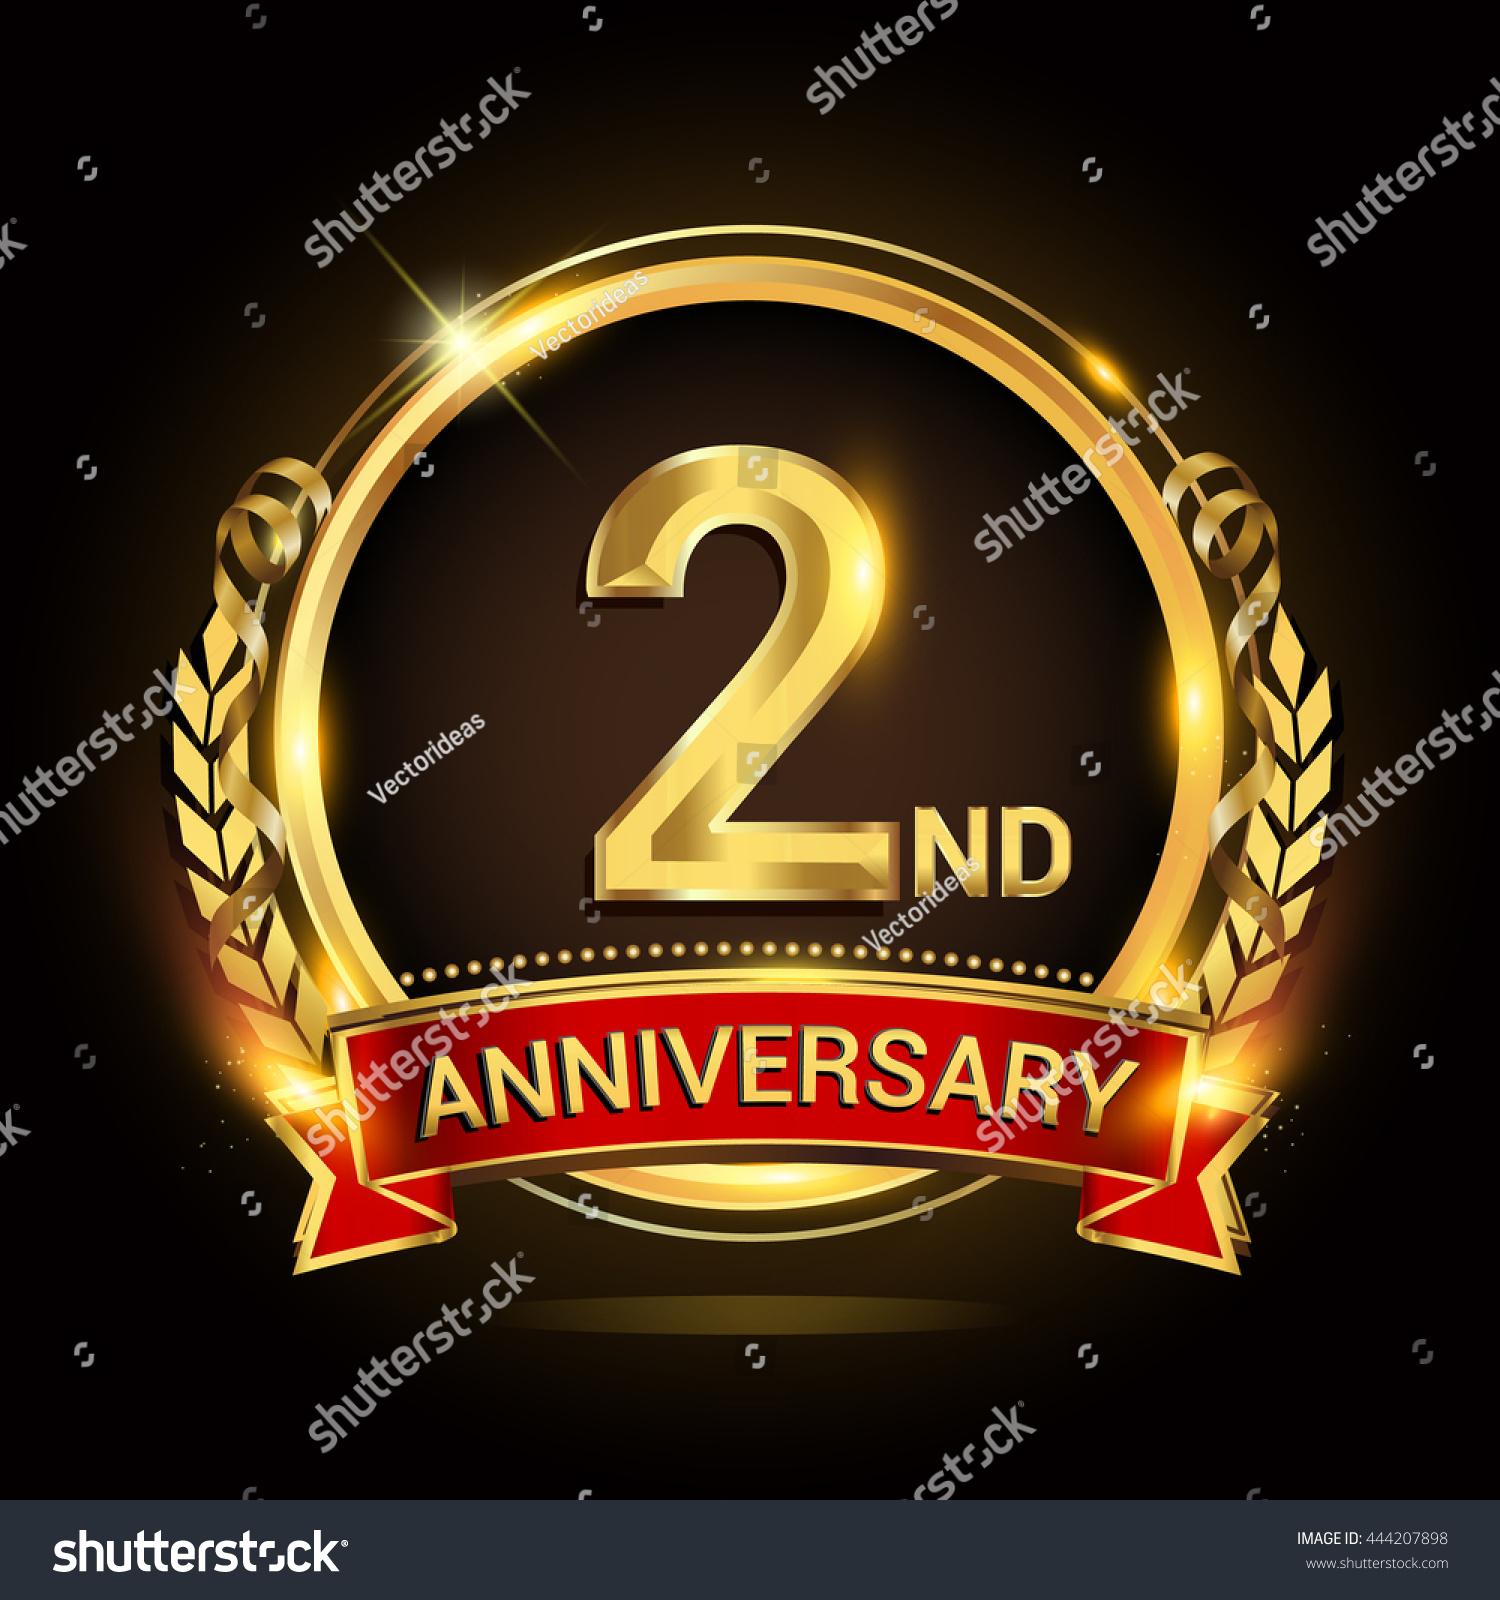 Nd golden anniversary logo shiny ring stock vector